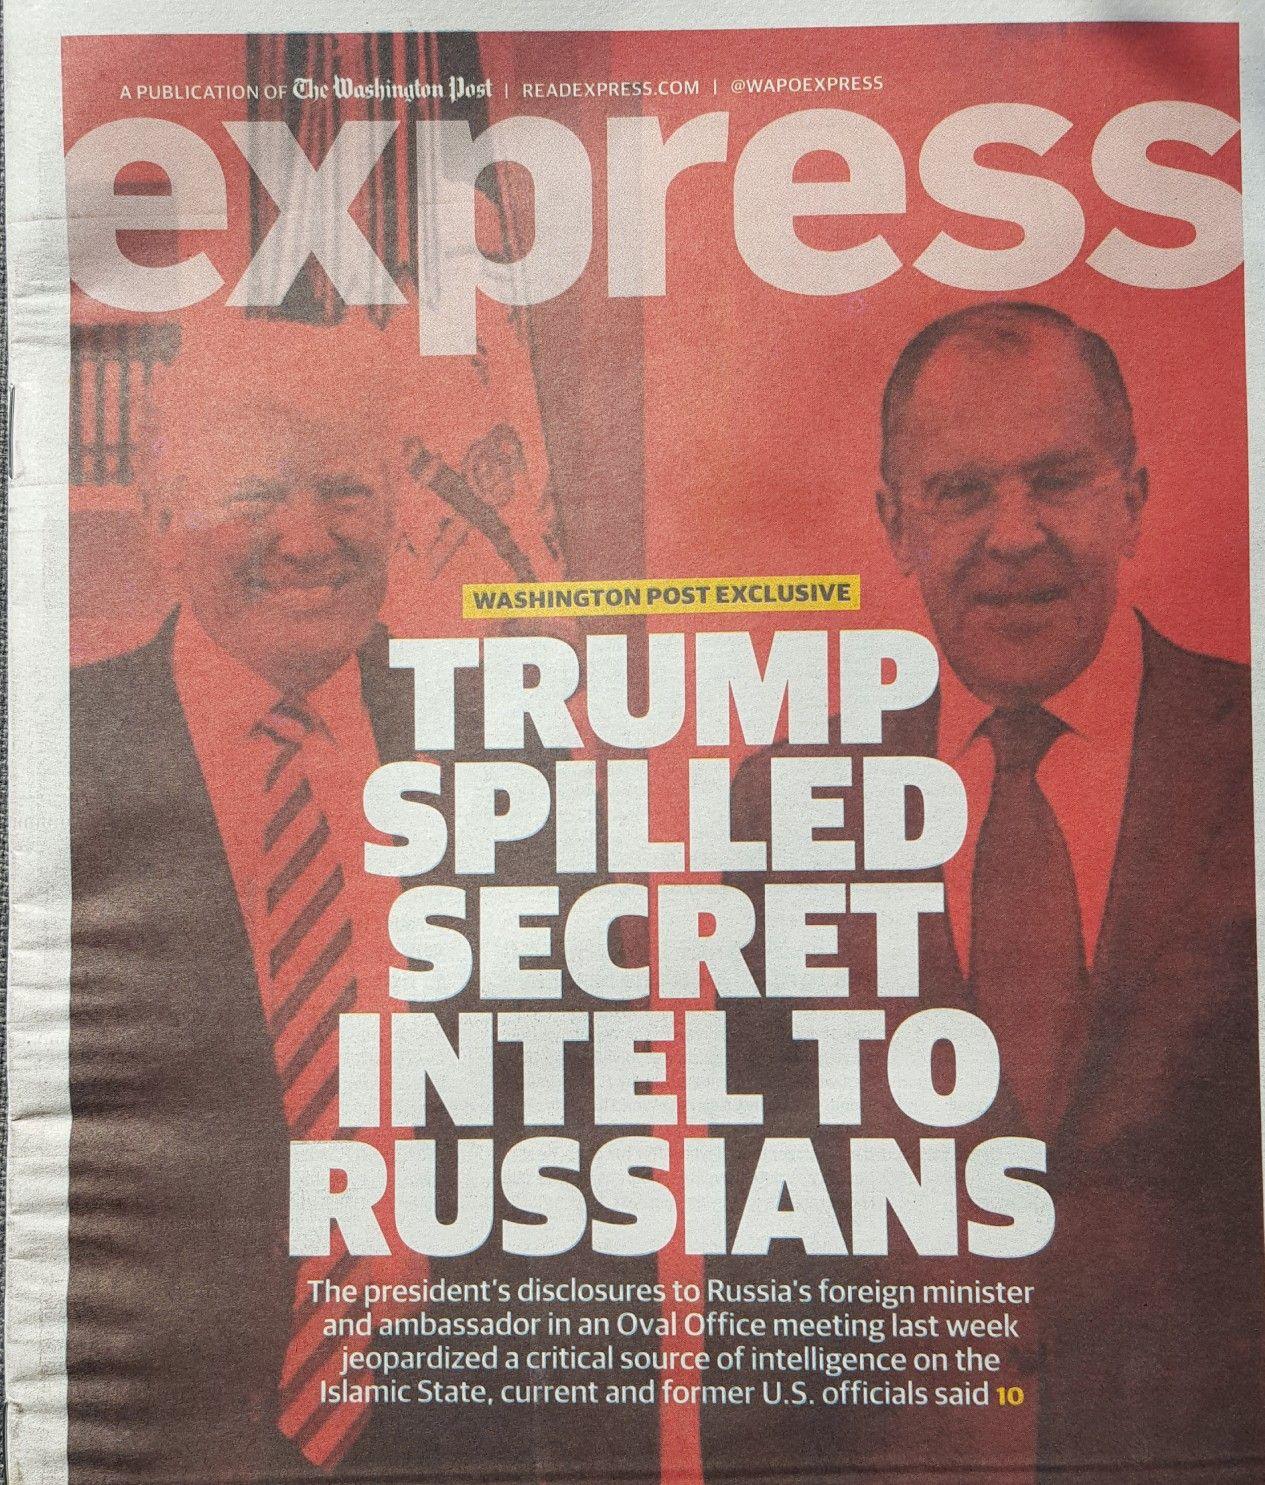 RepublicanRussianPuppet MorallyBankruptGOP